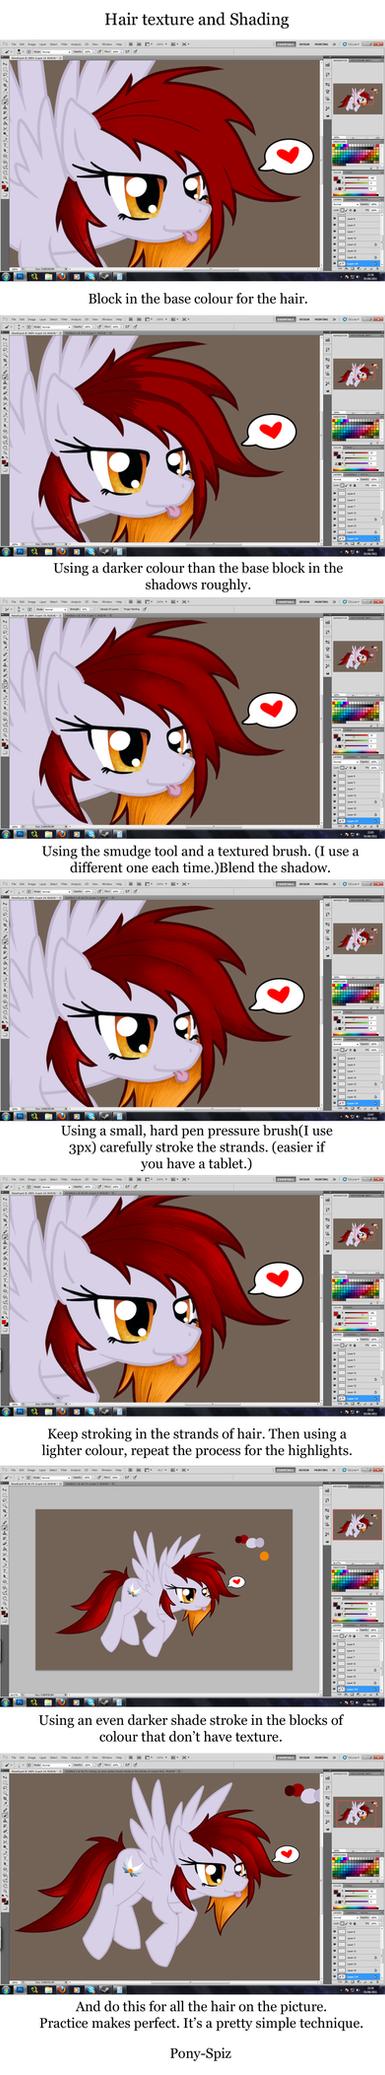 Mane: Shading and Texturing by Pony-Spiz